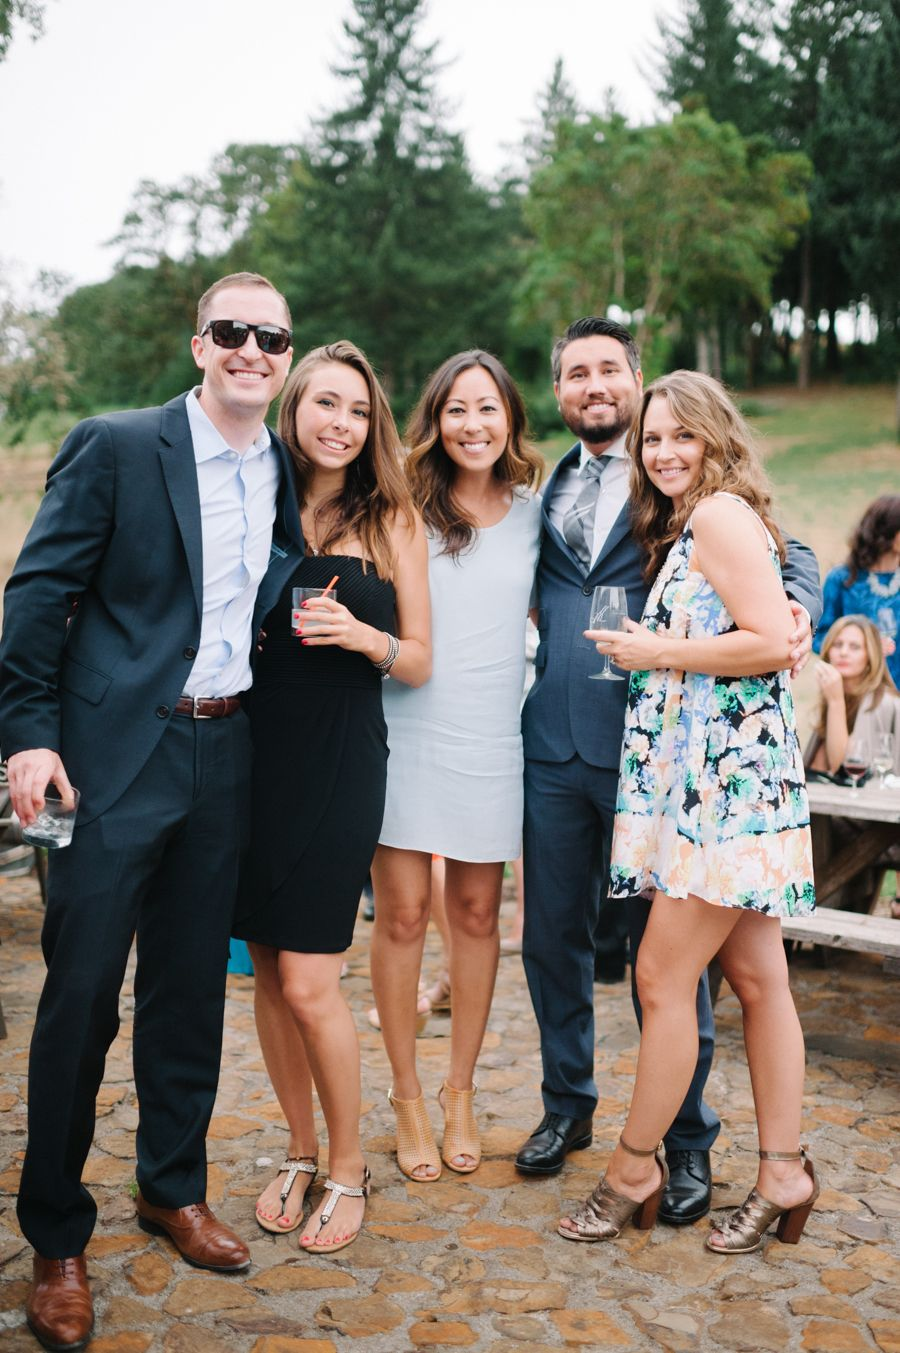 Elegant Oregon Vineyard Summer Wedding In 2018 Dresscode Chic